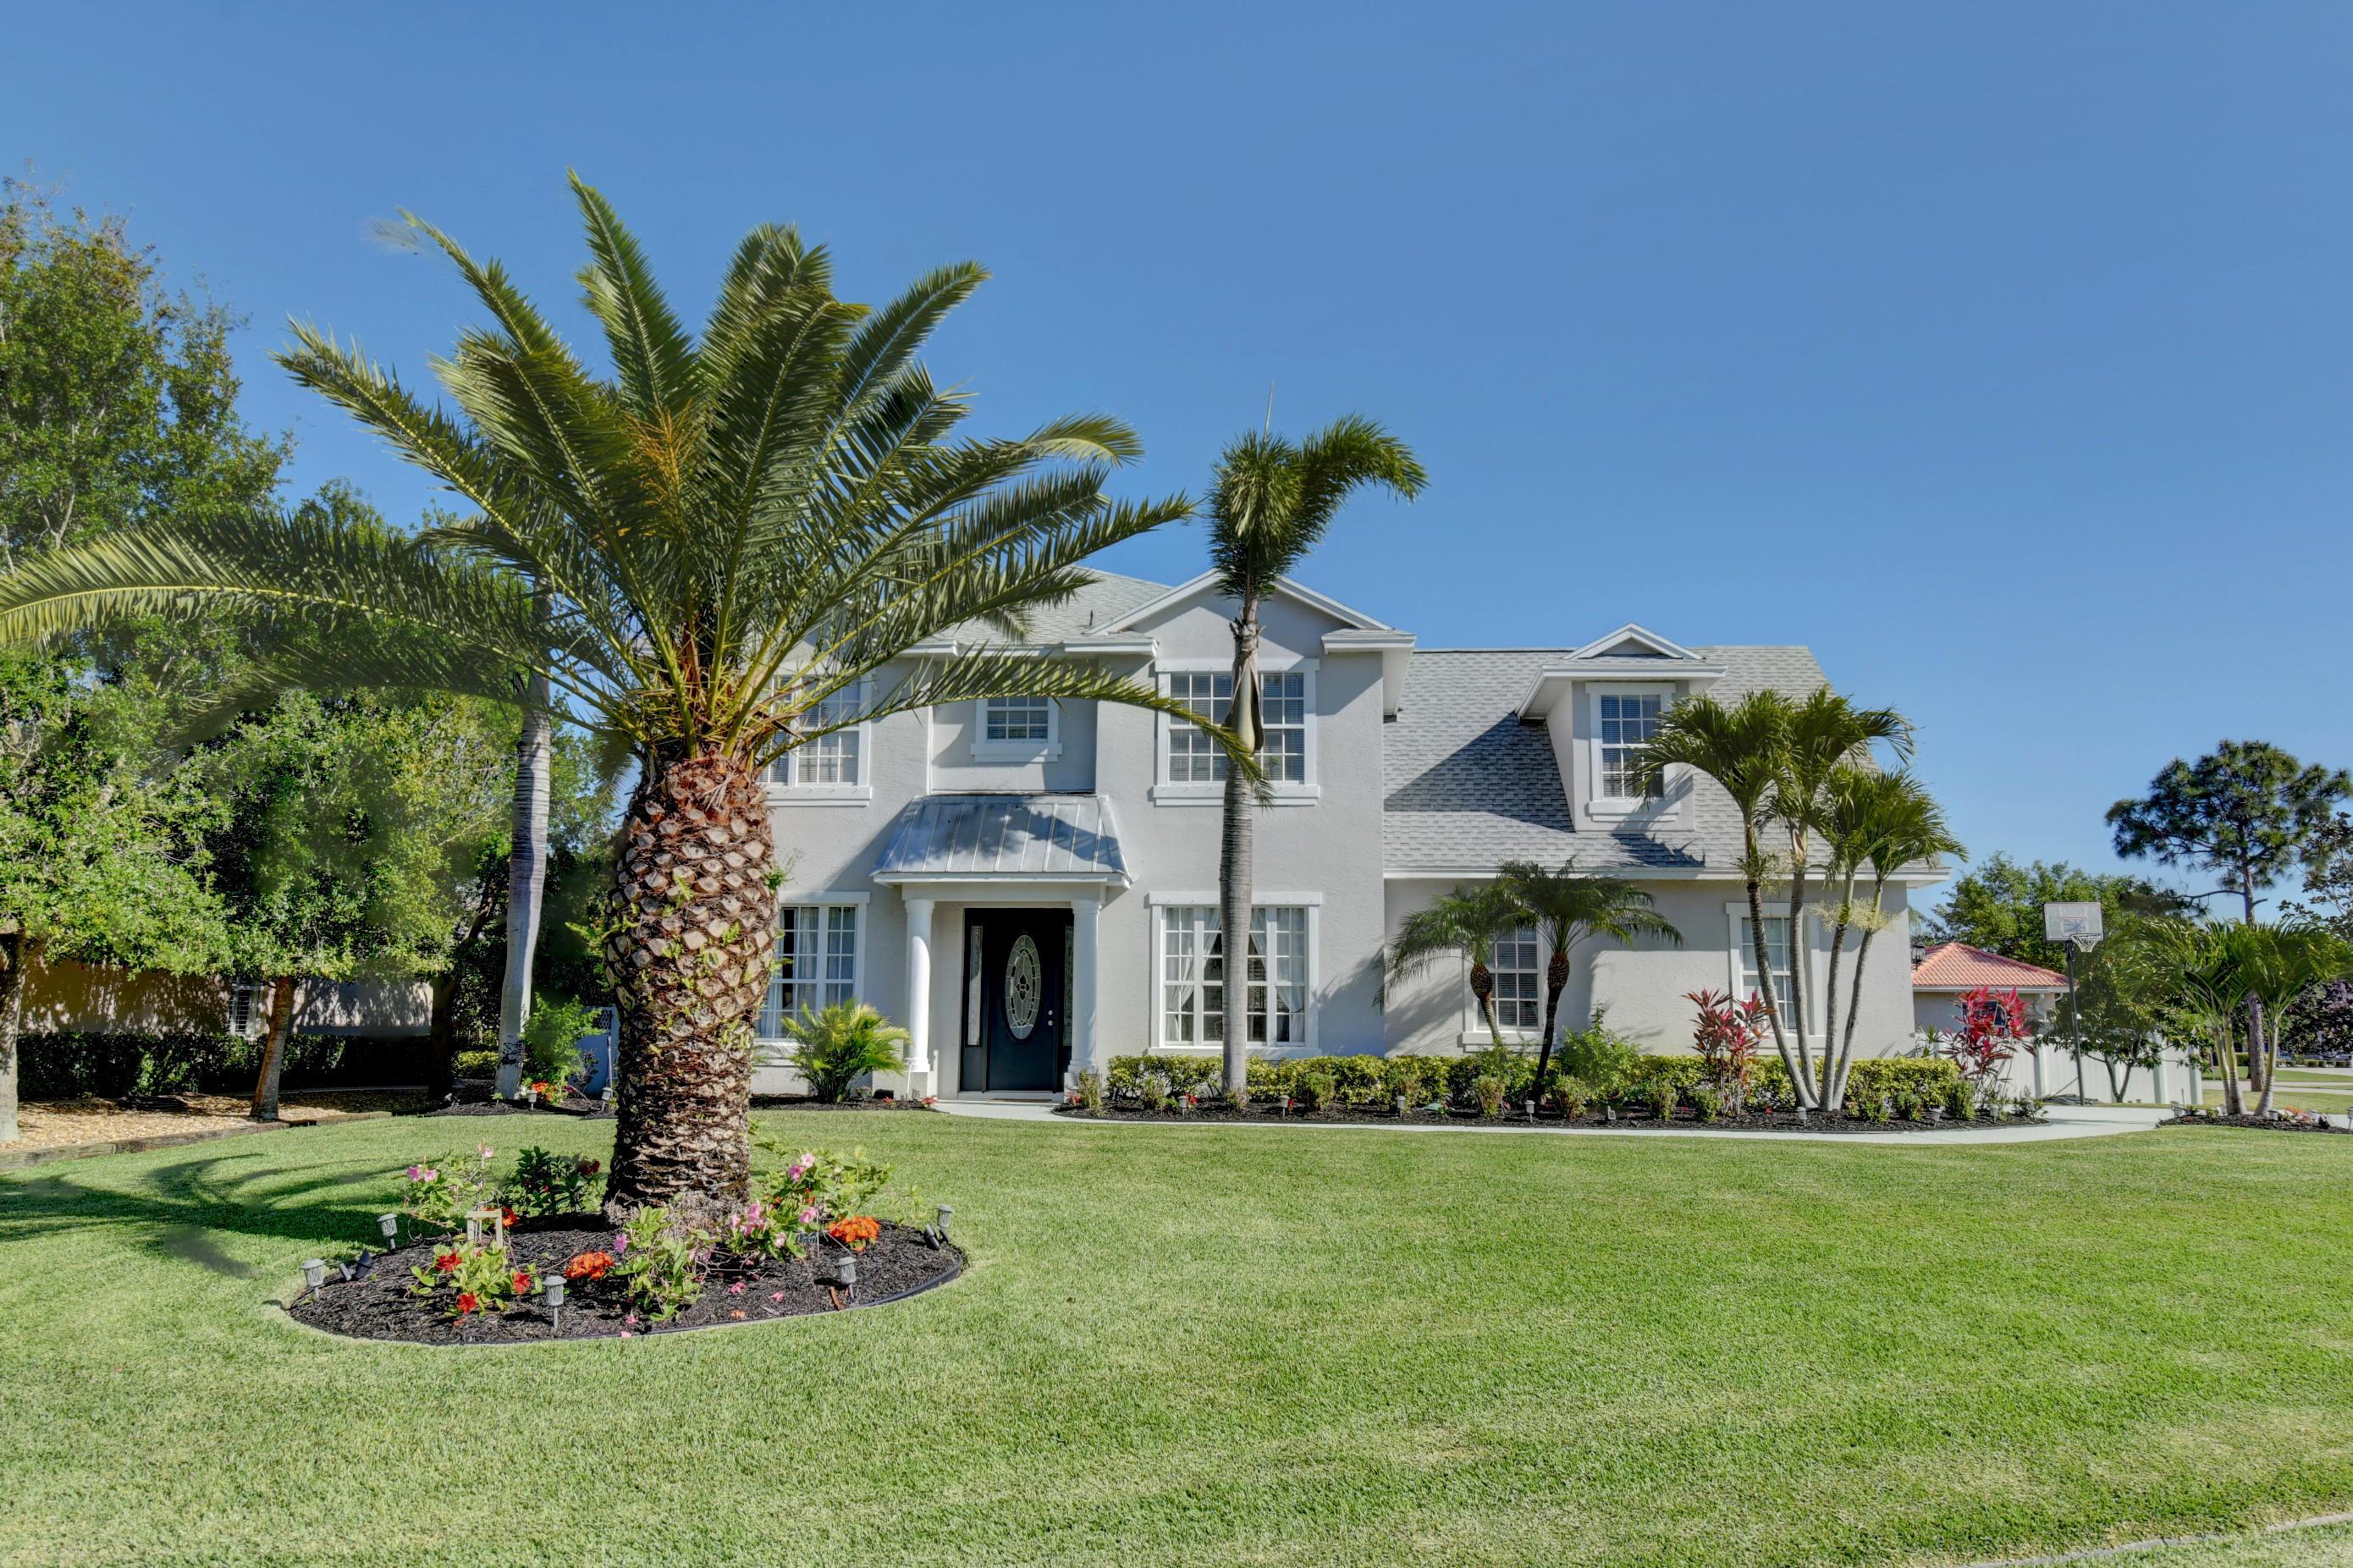 5811 Nw Windy Pines Lane, Port Saint Lucie, FL 34986